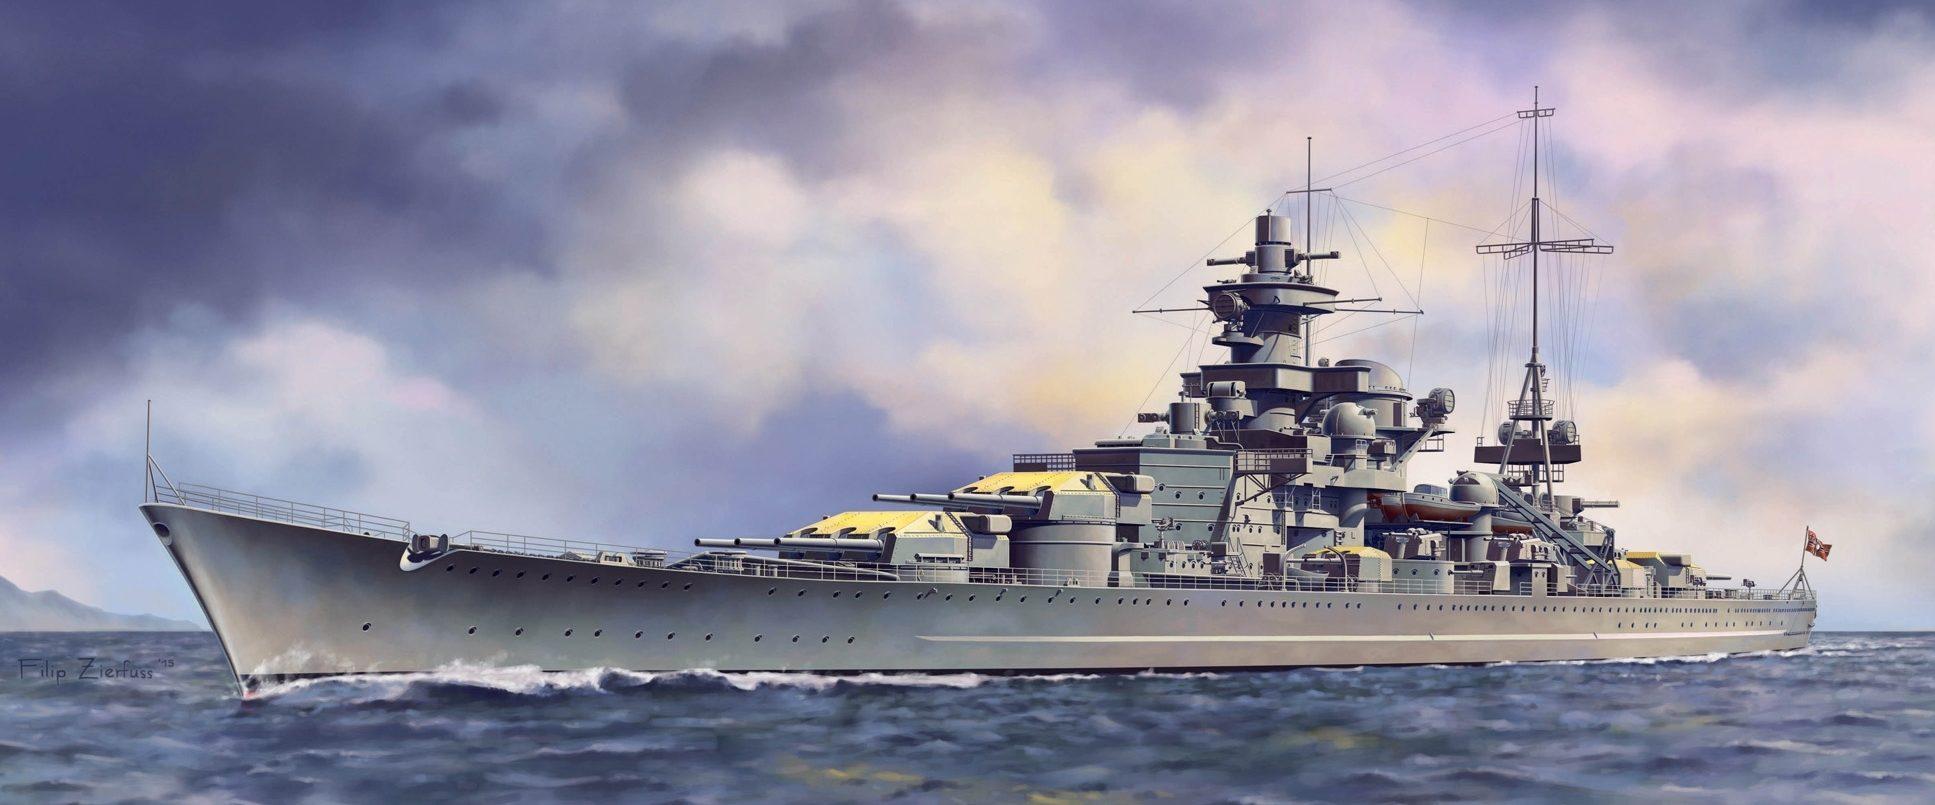 Zierfuss Filip. Линкор Scharnhorst.